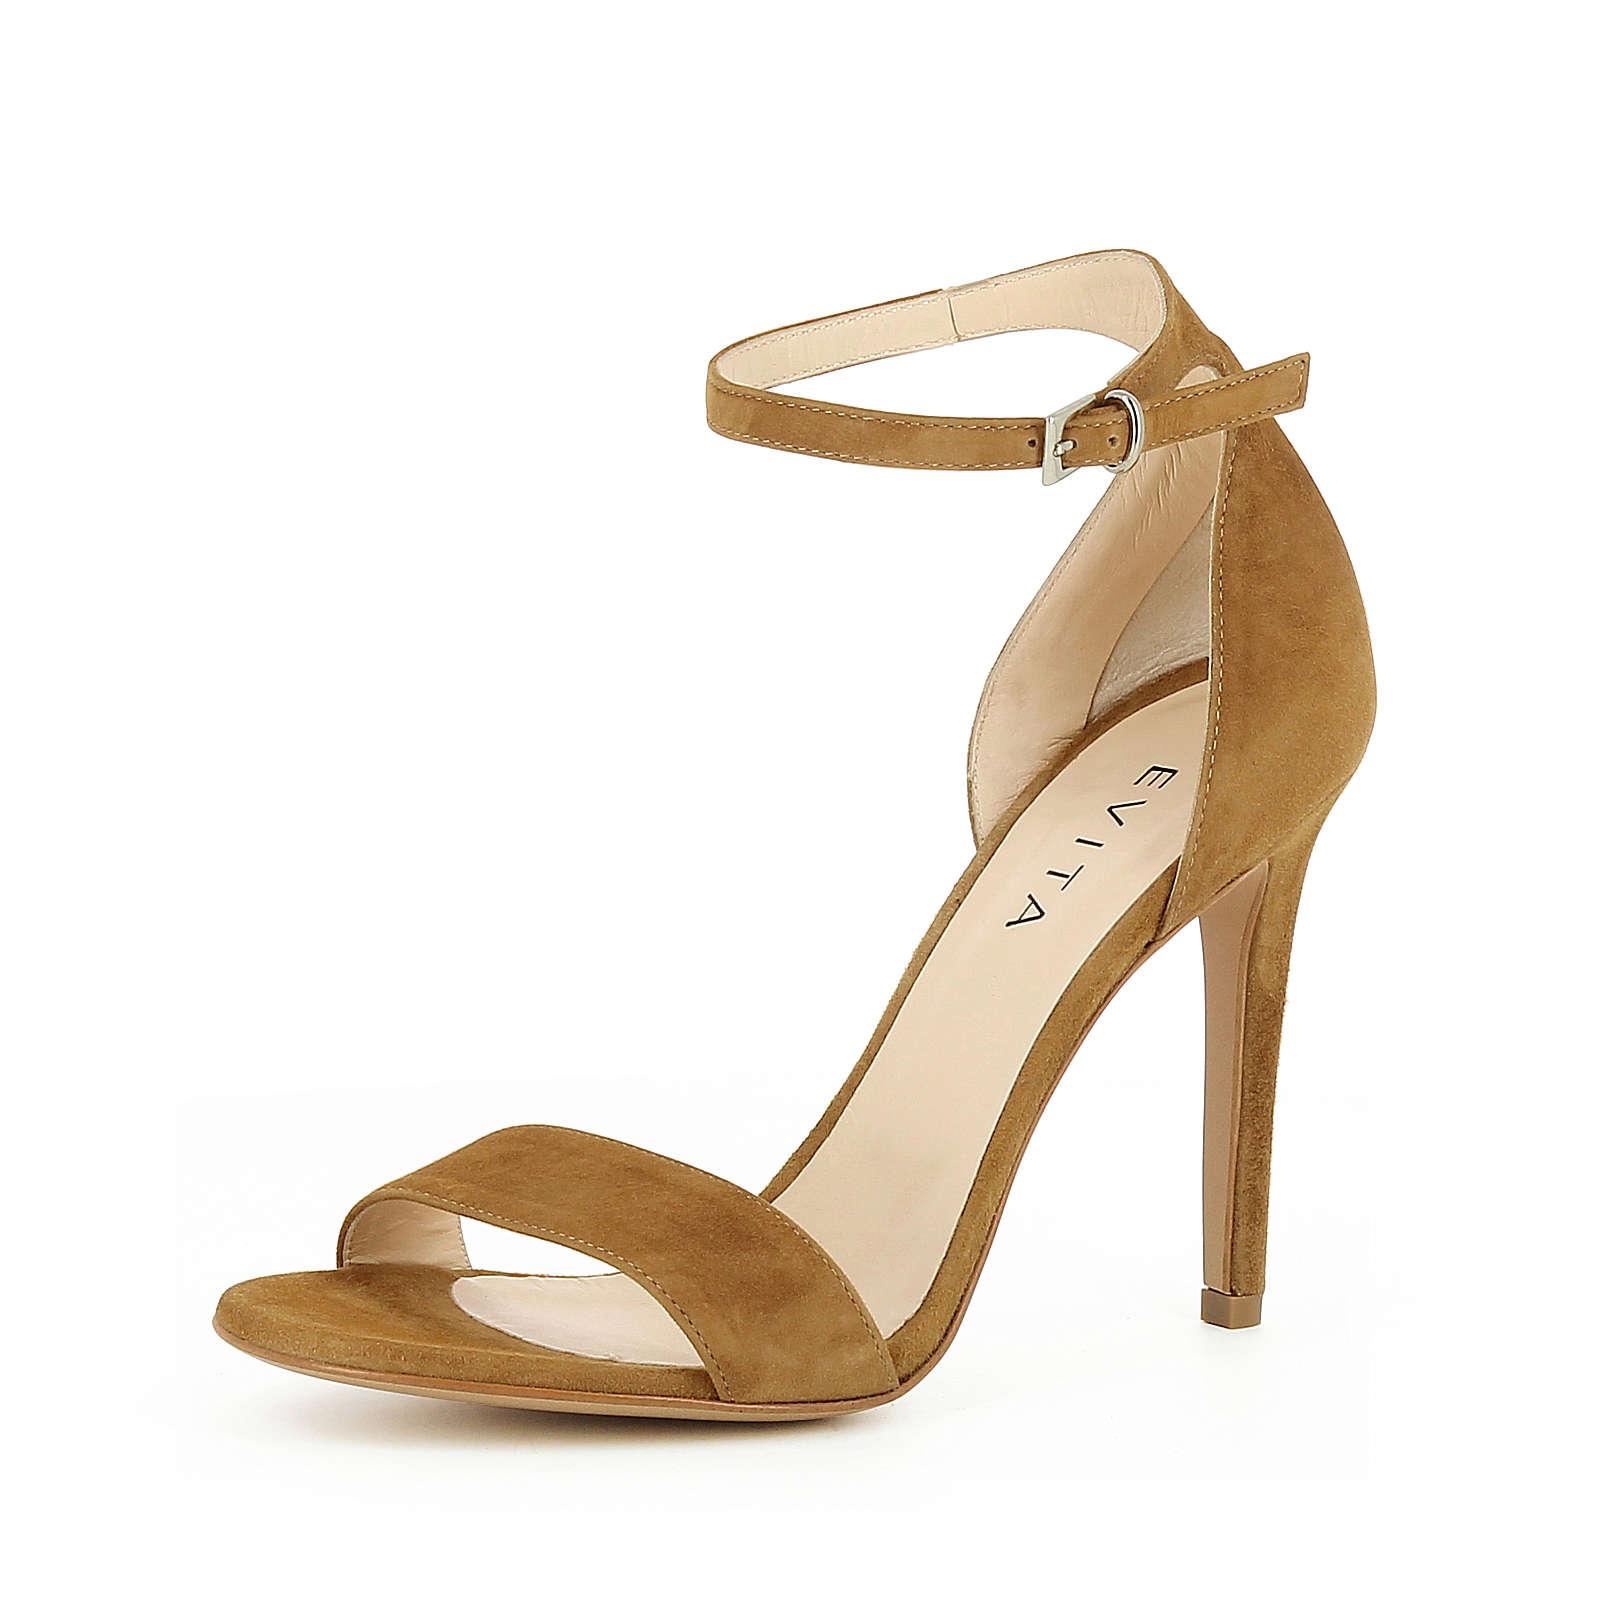 Evita Shoes Damen Sandalette EVA Klassische Sandaletten cognac Damen Gr. 34